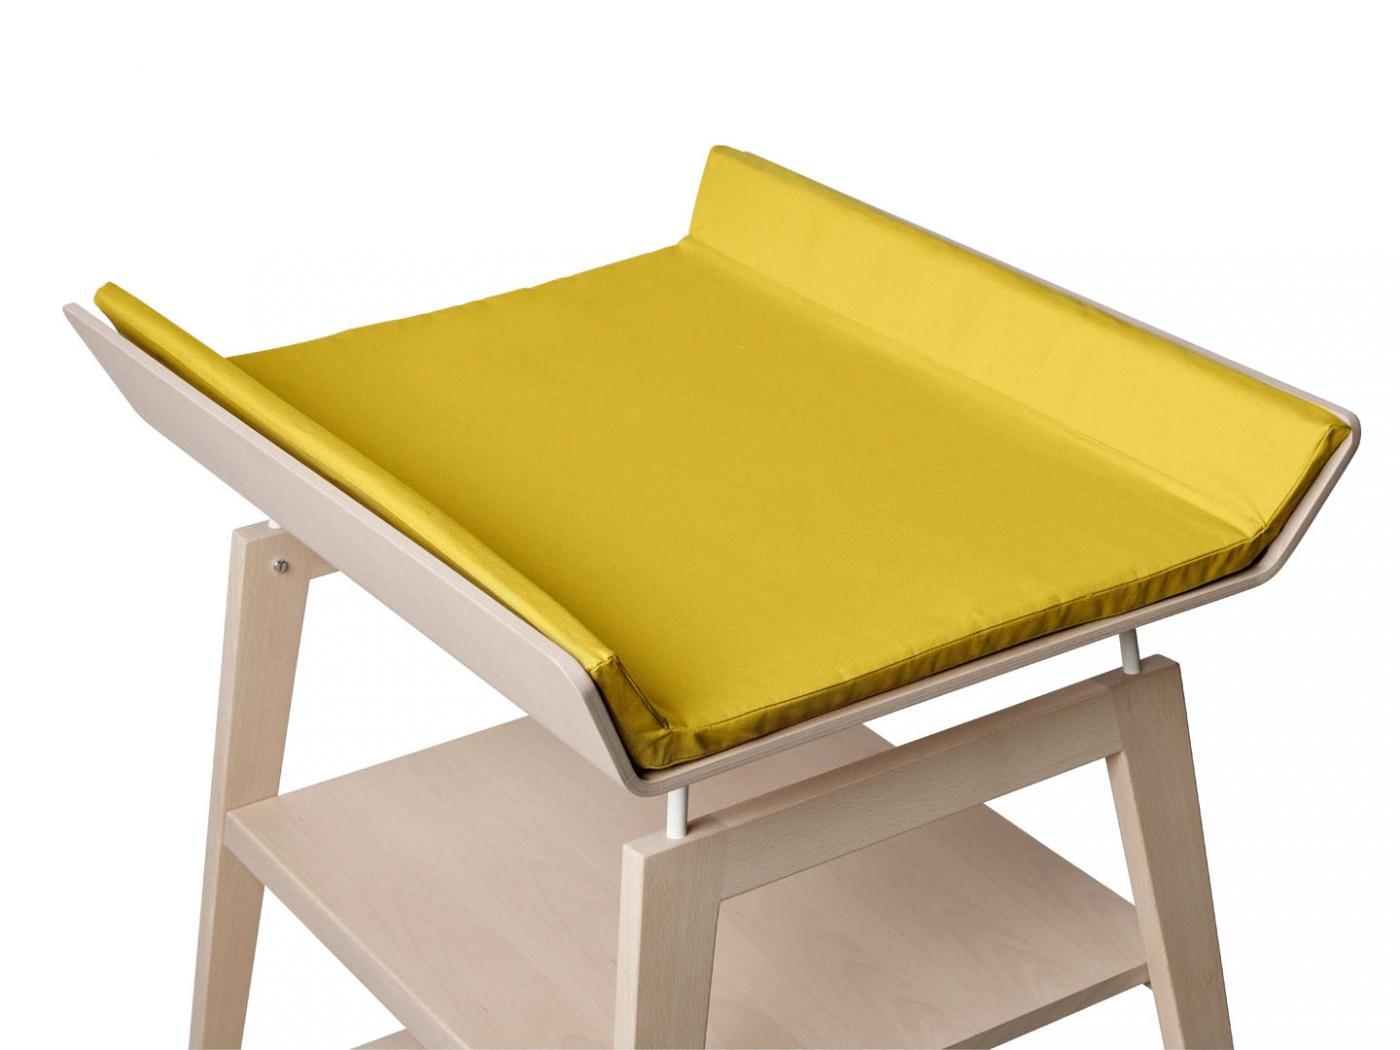 leander housse matelas langer curry pour table. Black Bedroom Furniture Sets. Home Design Ideas